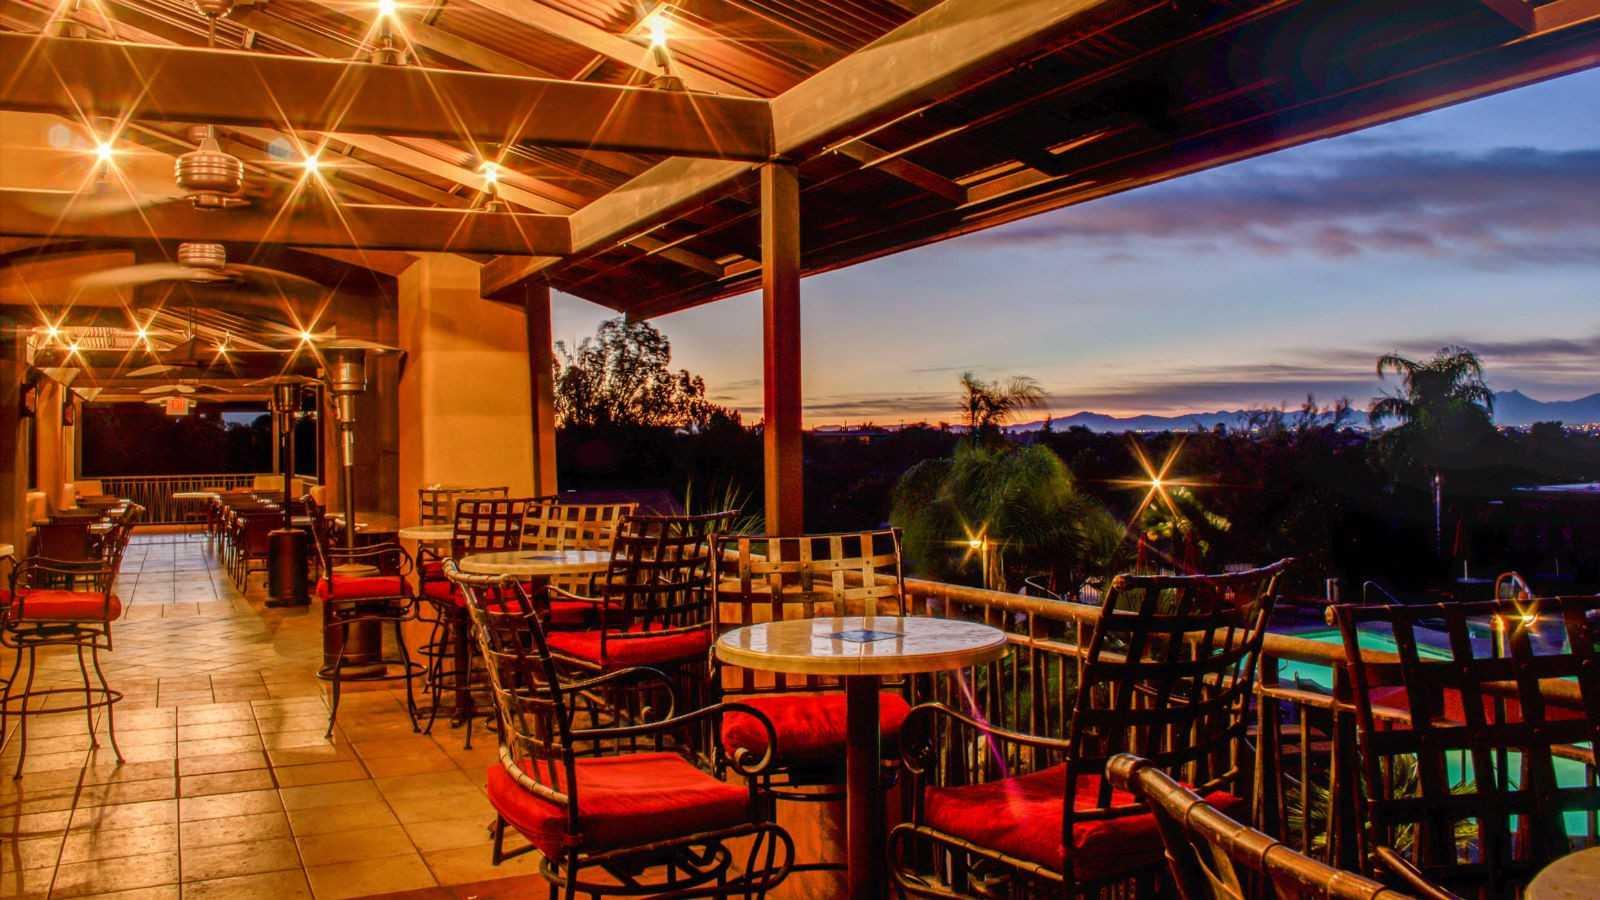 Tucson Private Parties Gringo Grill Cantina Restaurant